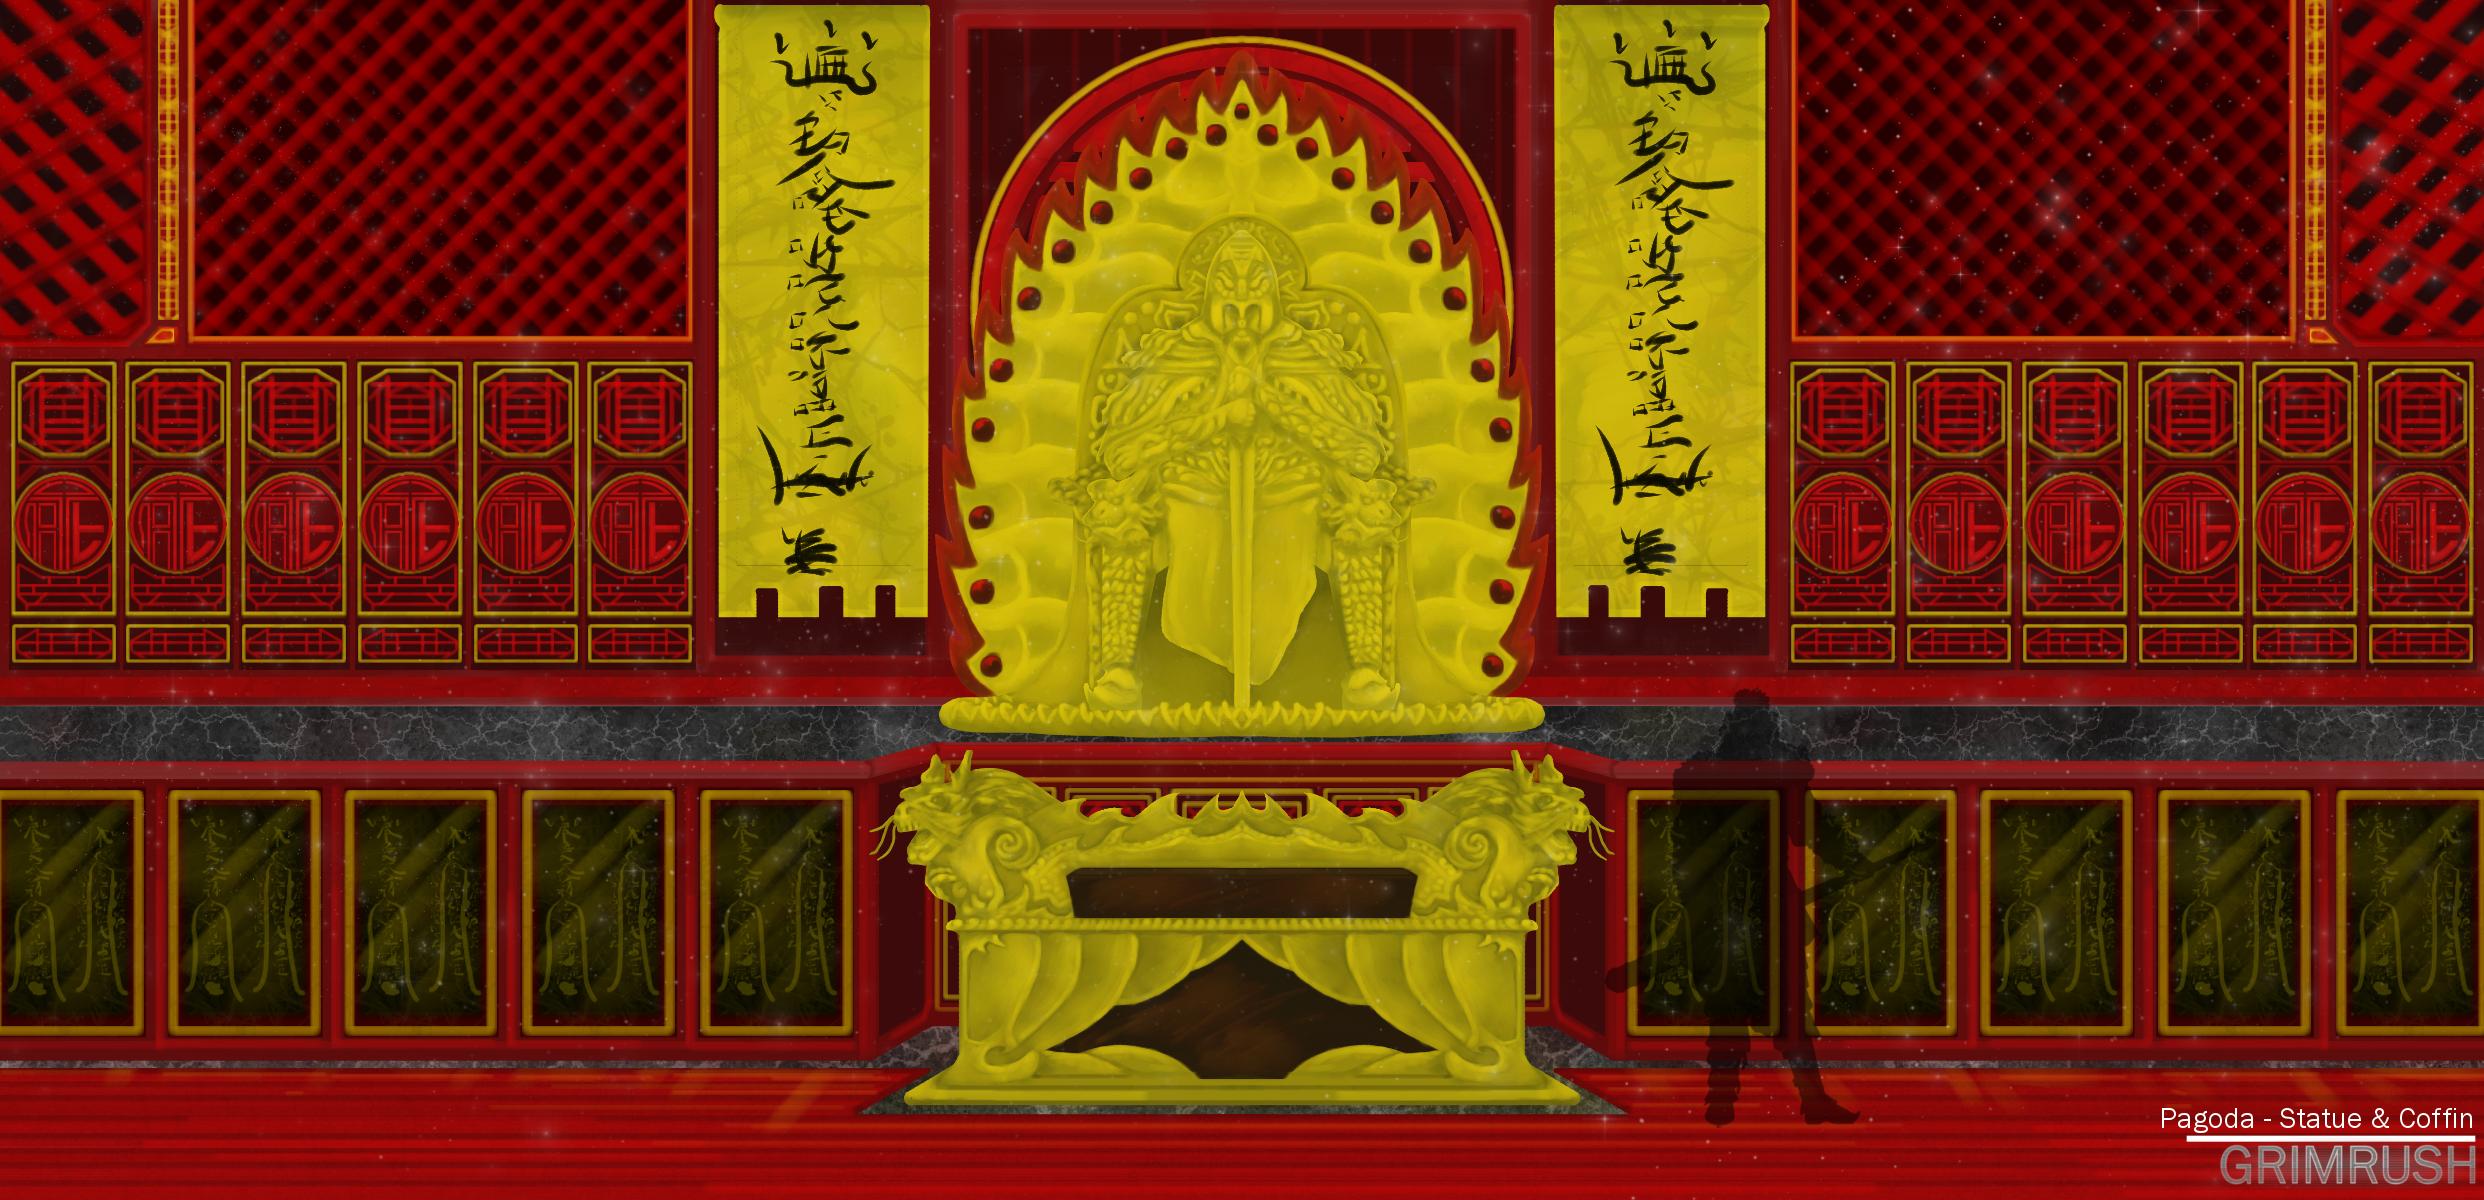 pagoda SC Sheet